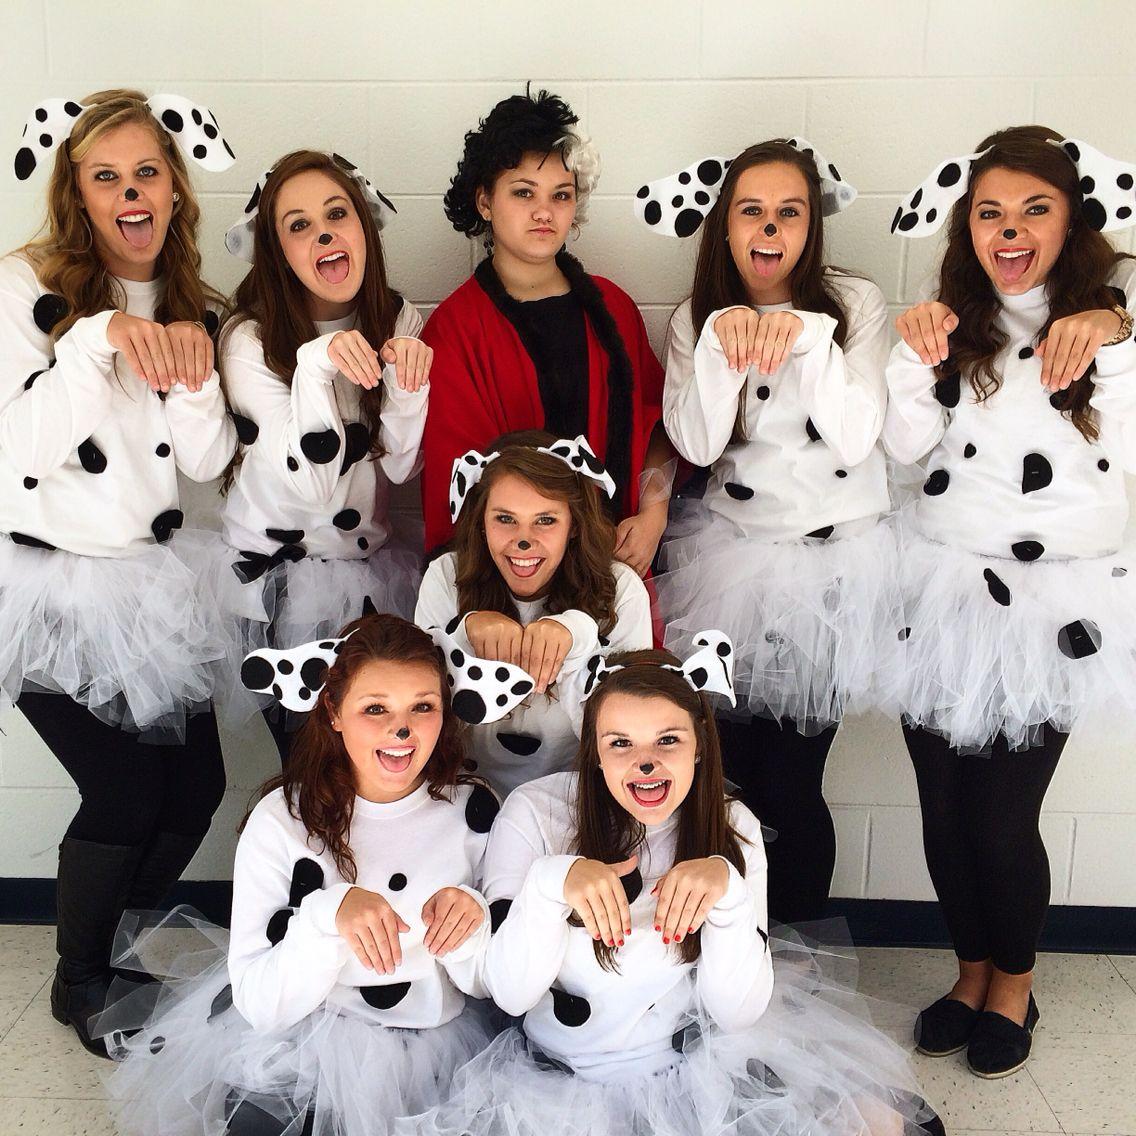 Diy 101 Dalmatian Costumes Spirit Week Halloween Costume #spiritweek #costume